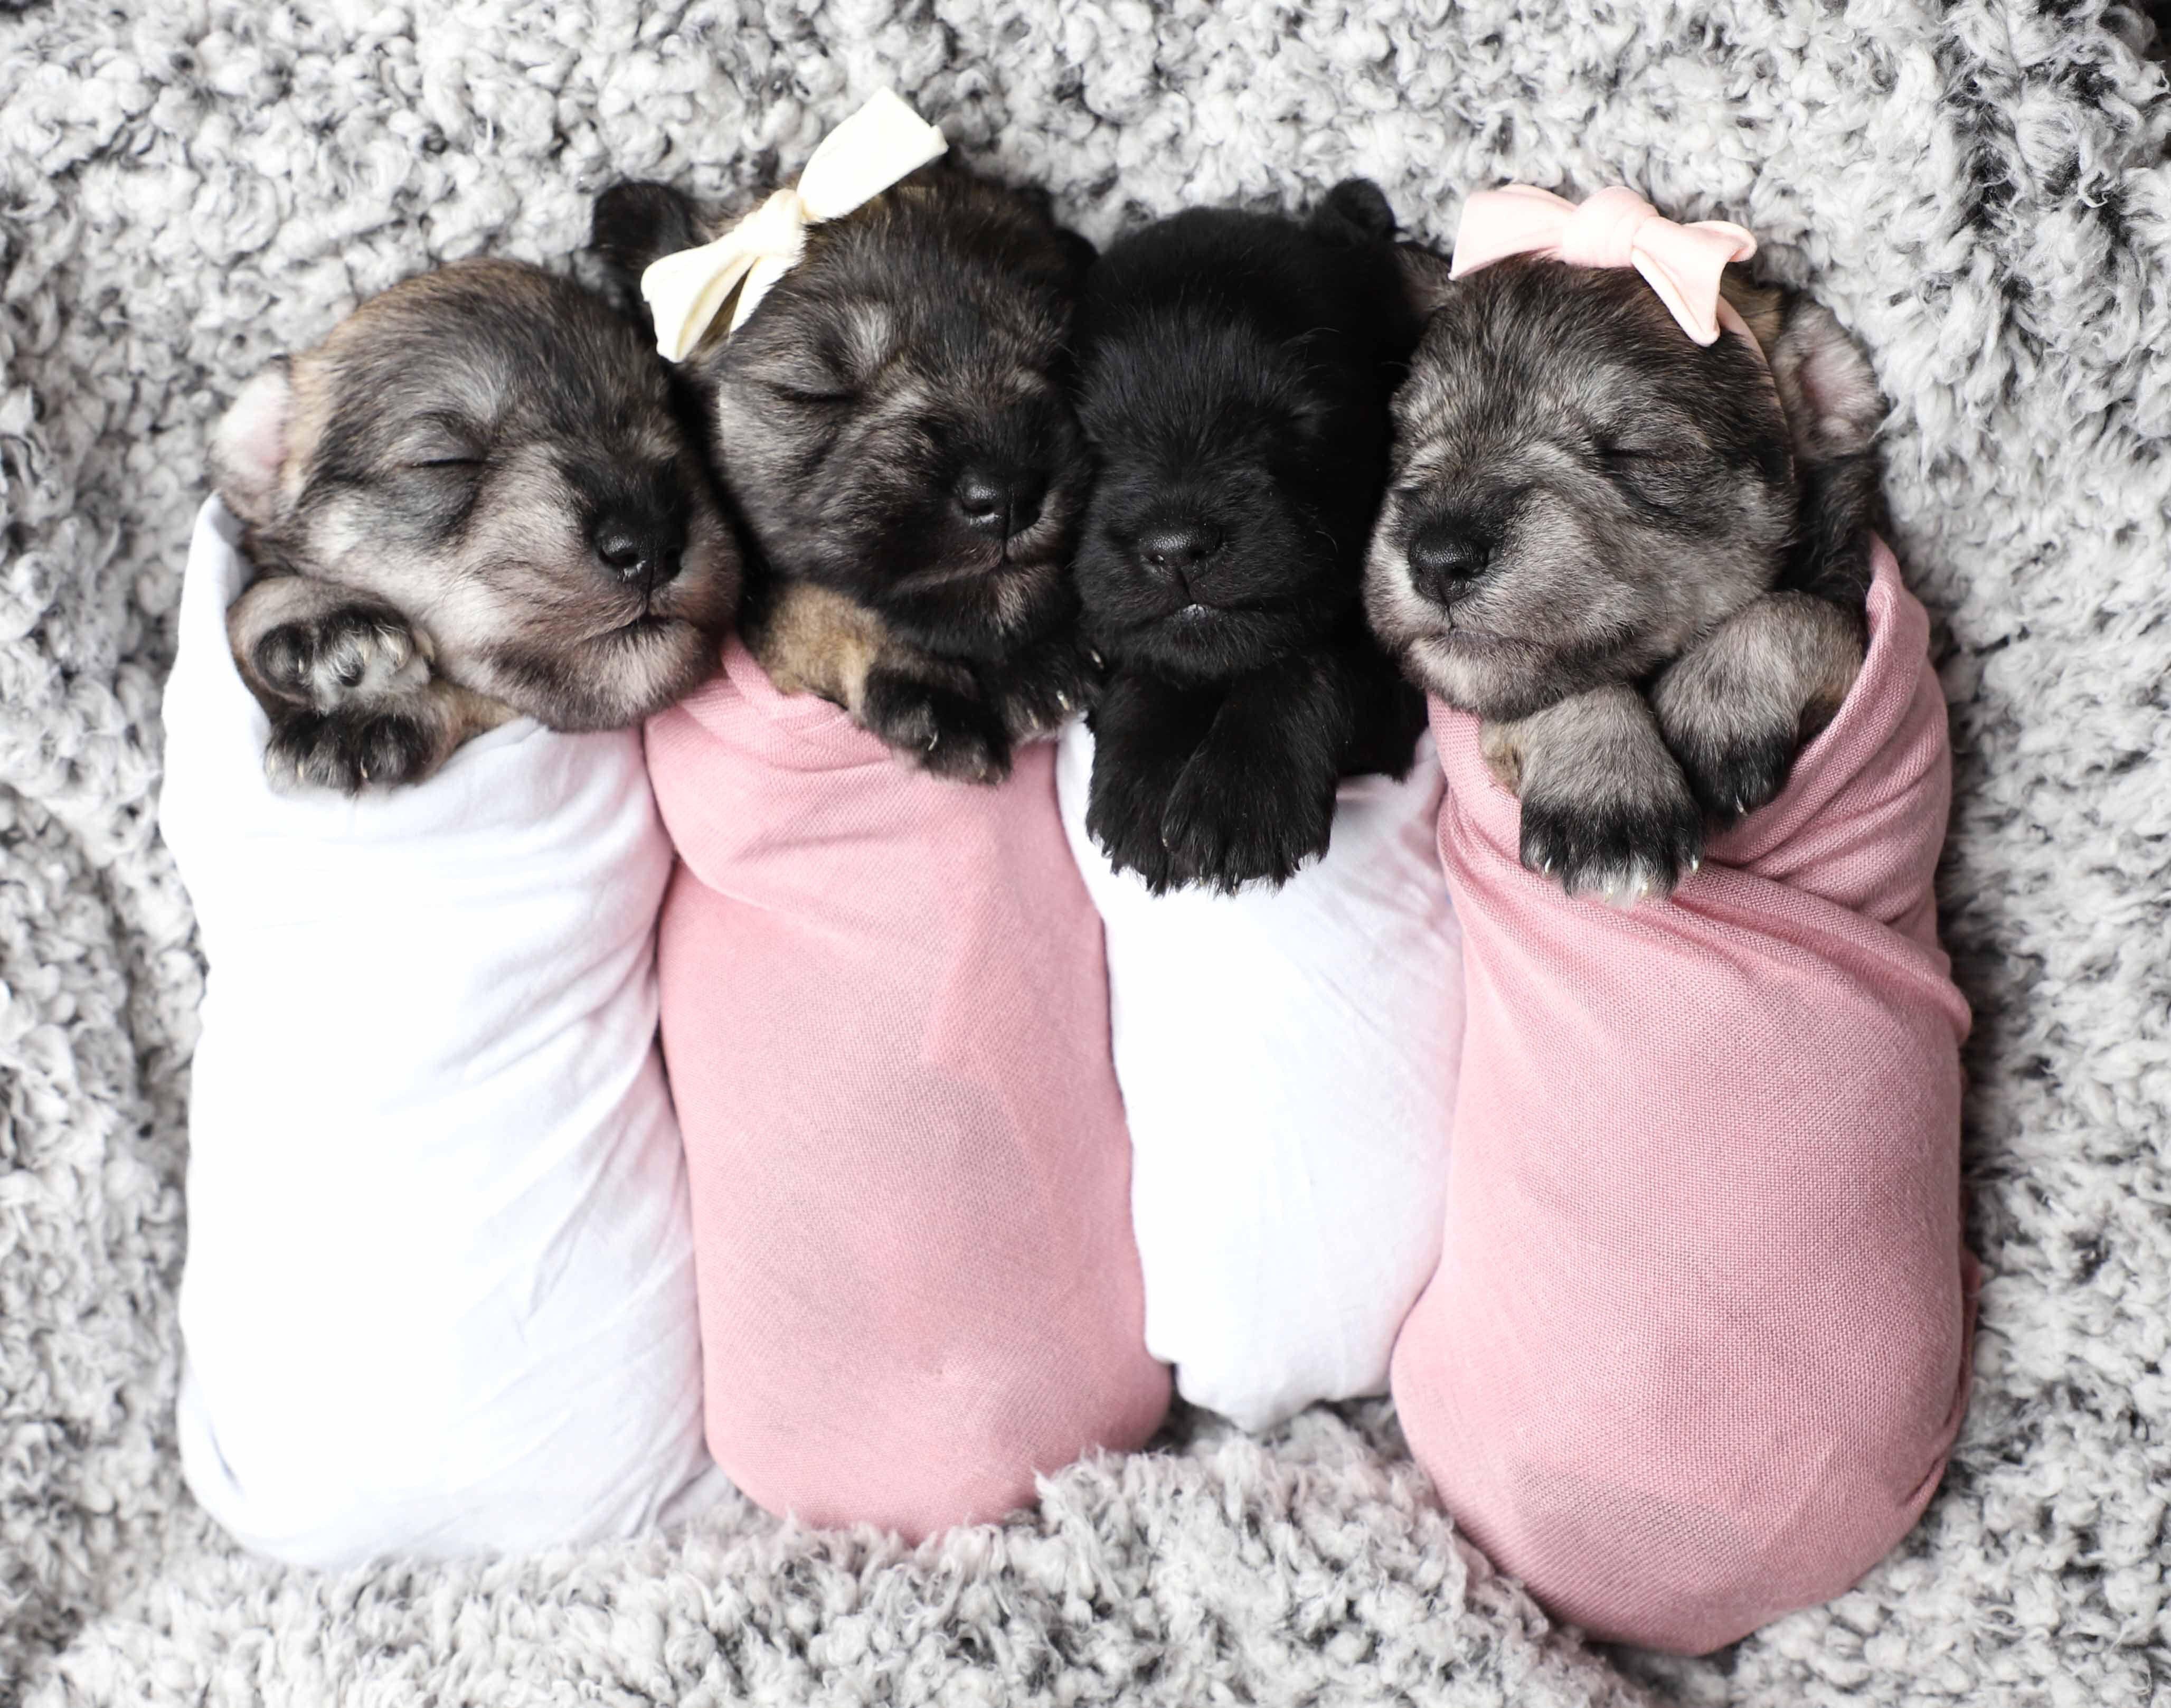 Newborn Puppies Image By Amber Barnett On Pics In 2020 Miniature